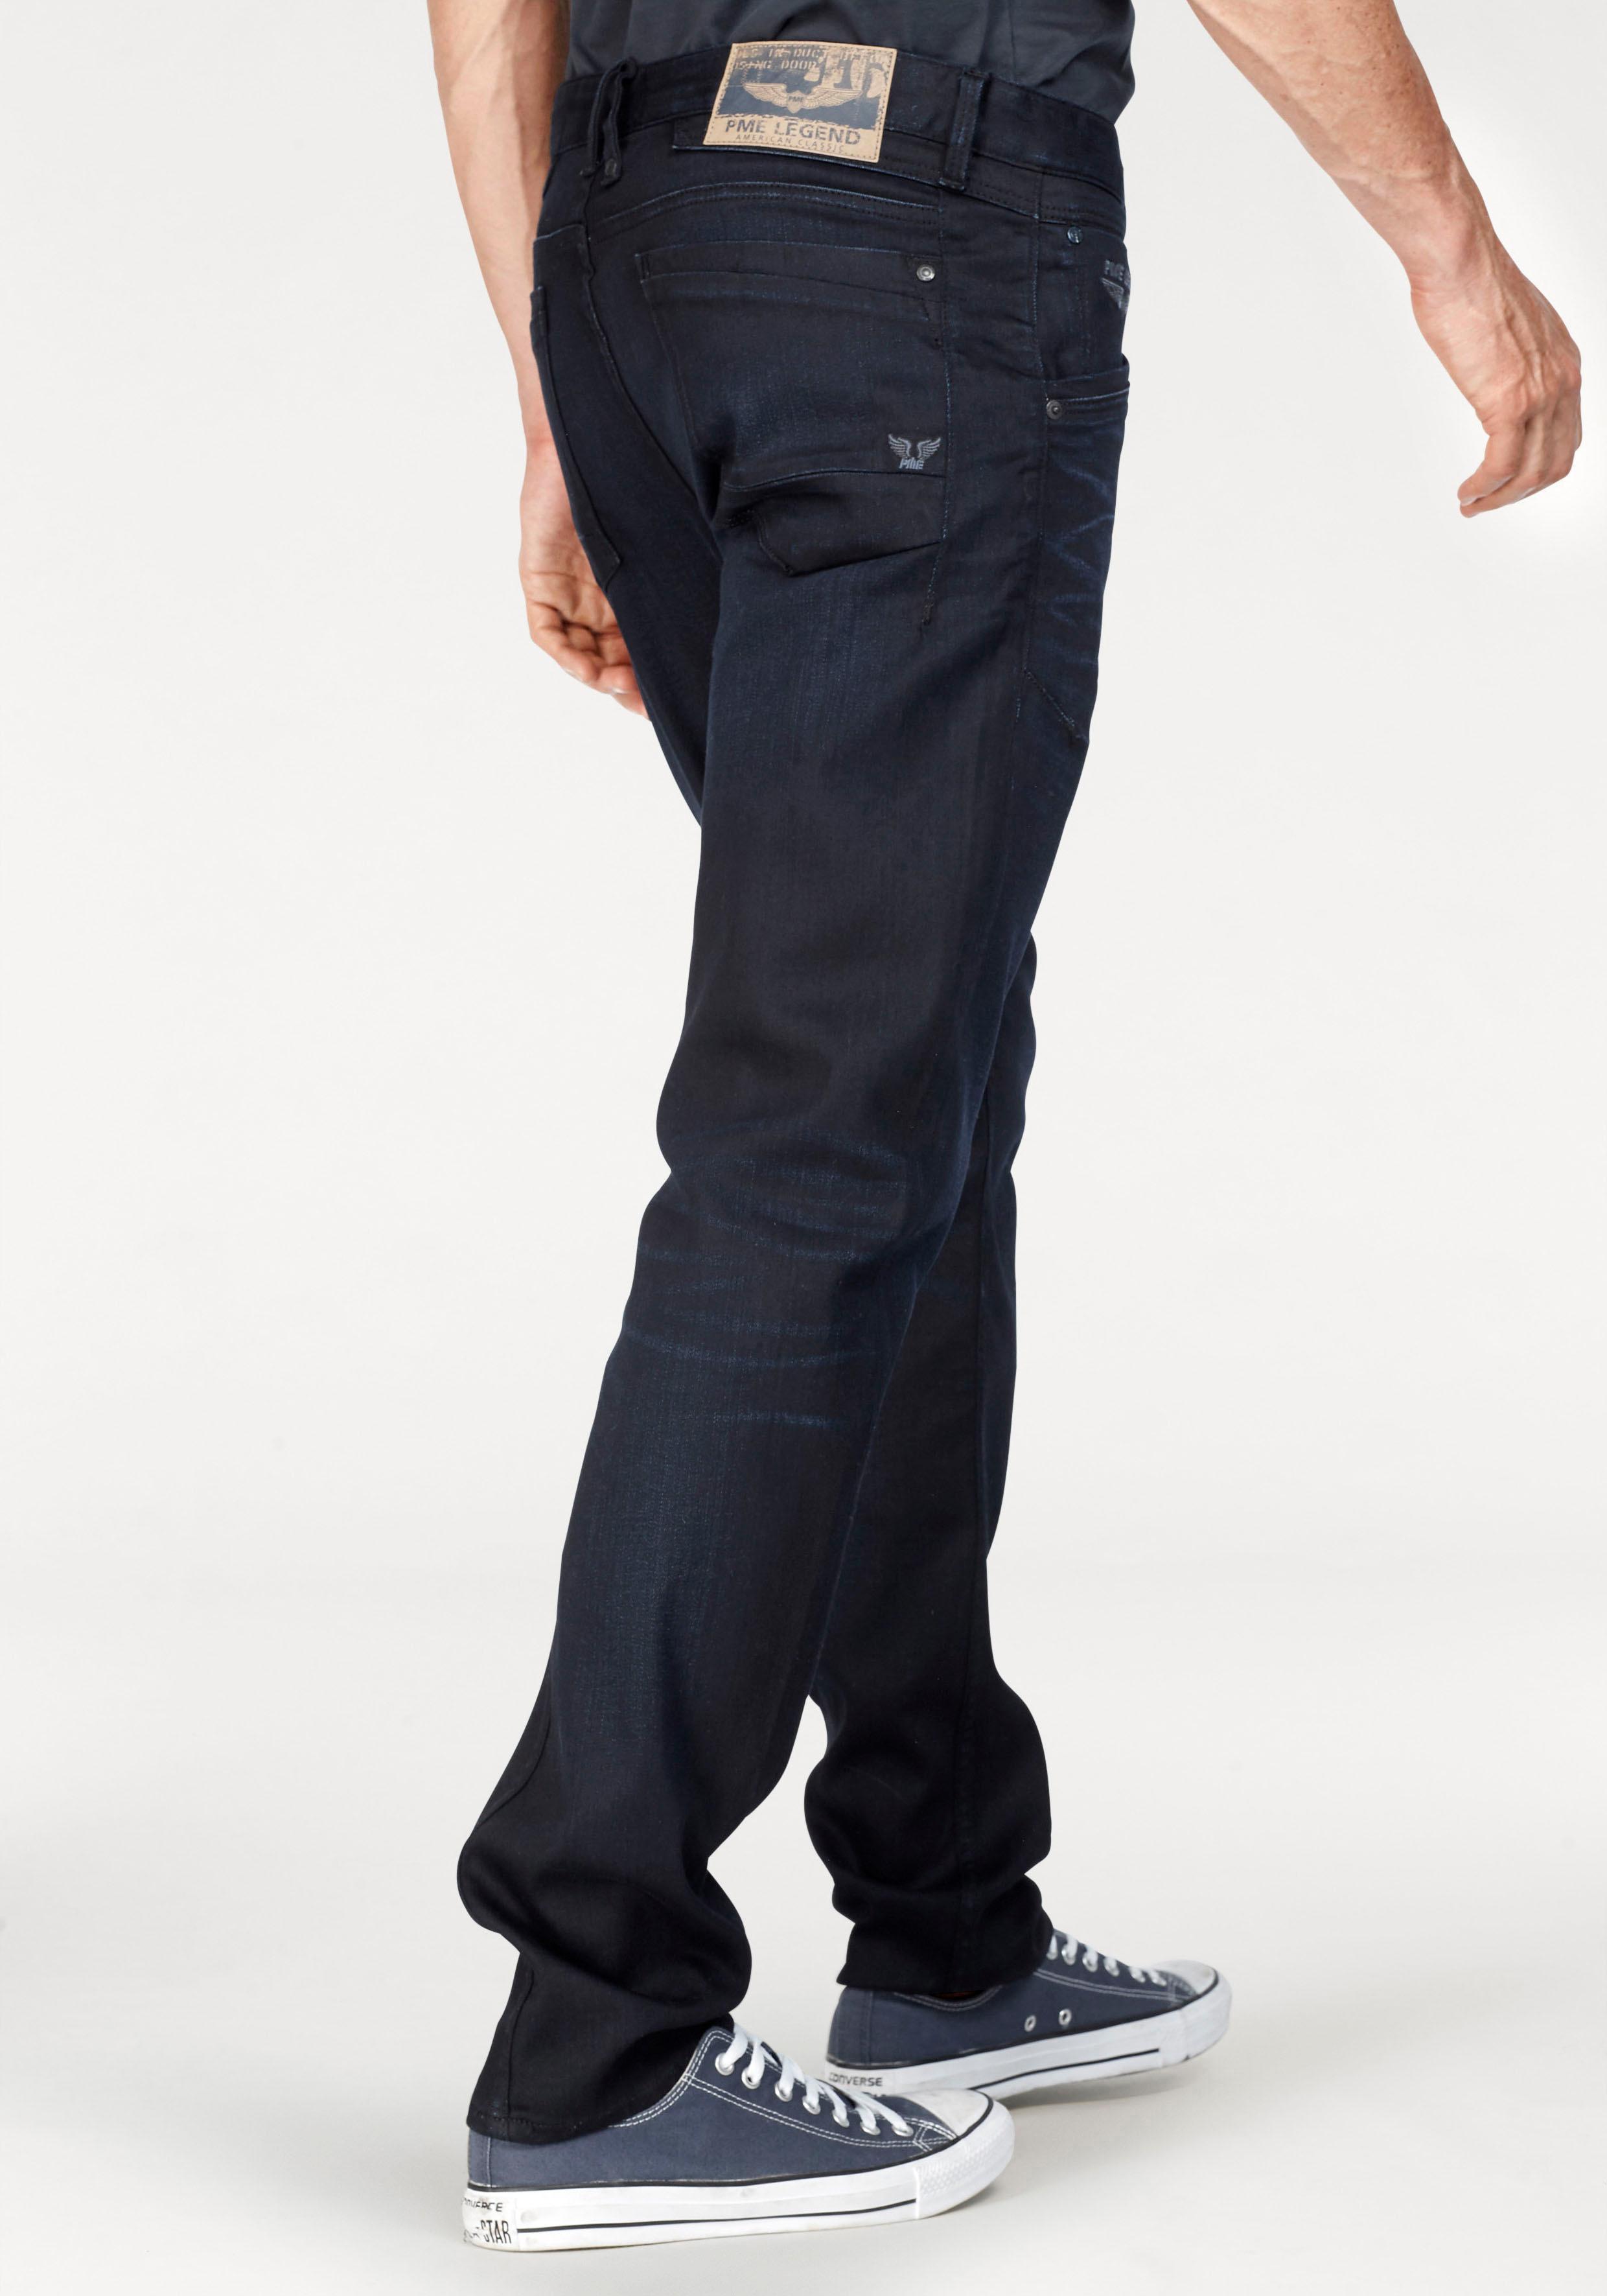 PME LEGEND Straight-Jeans CURTIS   Bekleidung > Jeans > Sonstige Jeans   Blau   Pme Legend